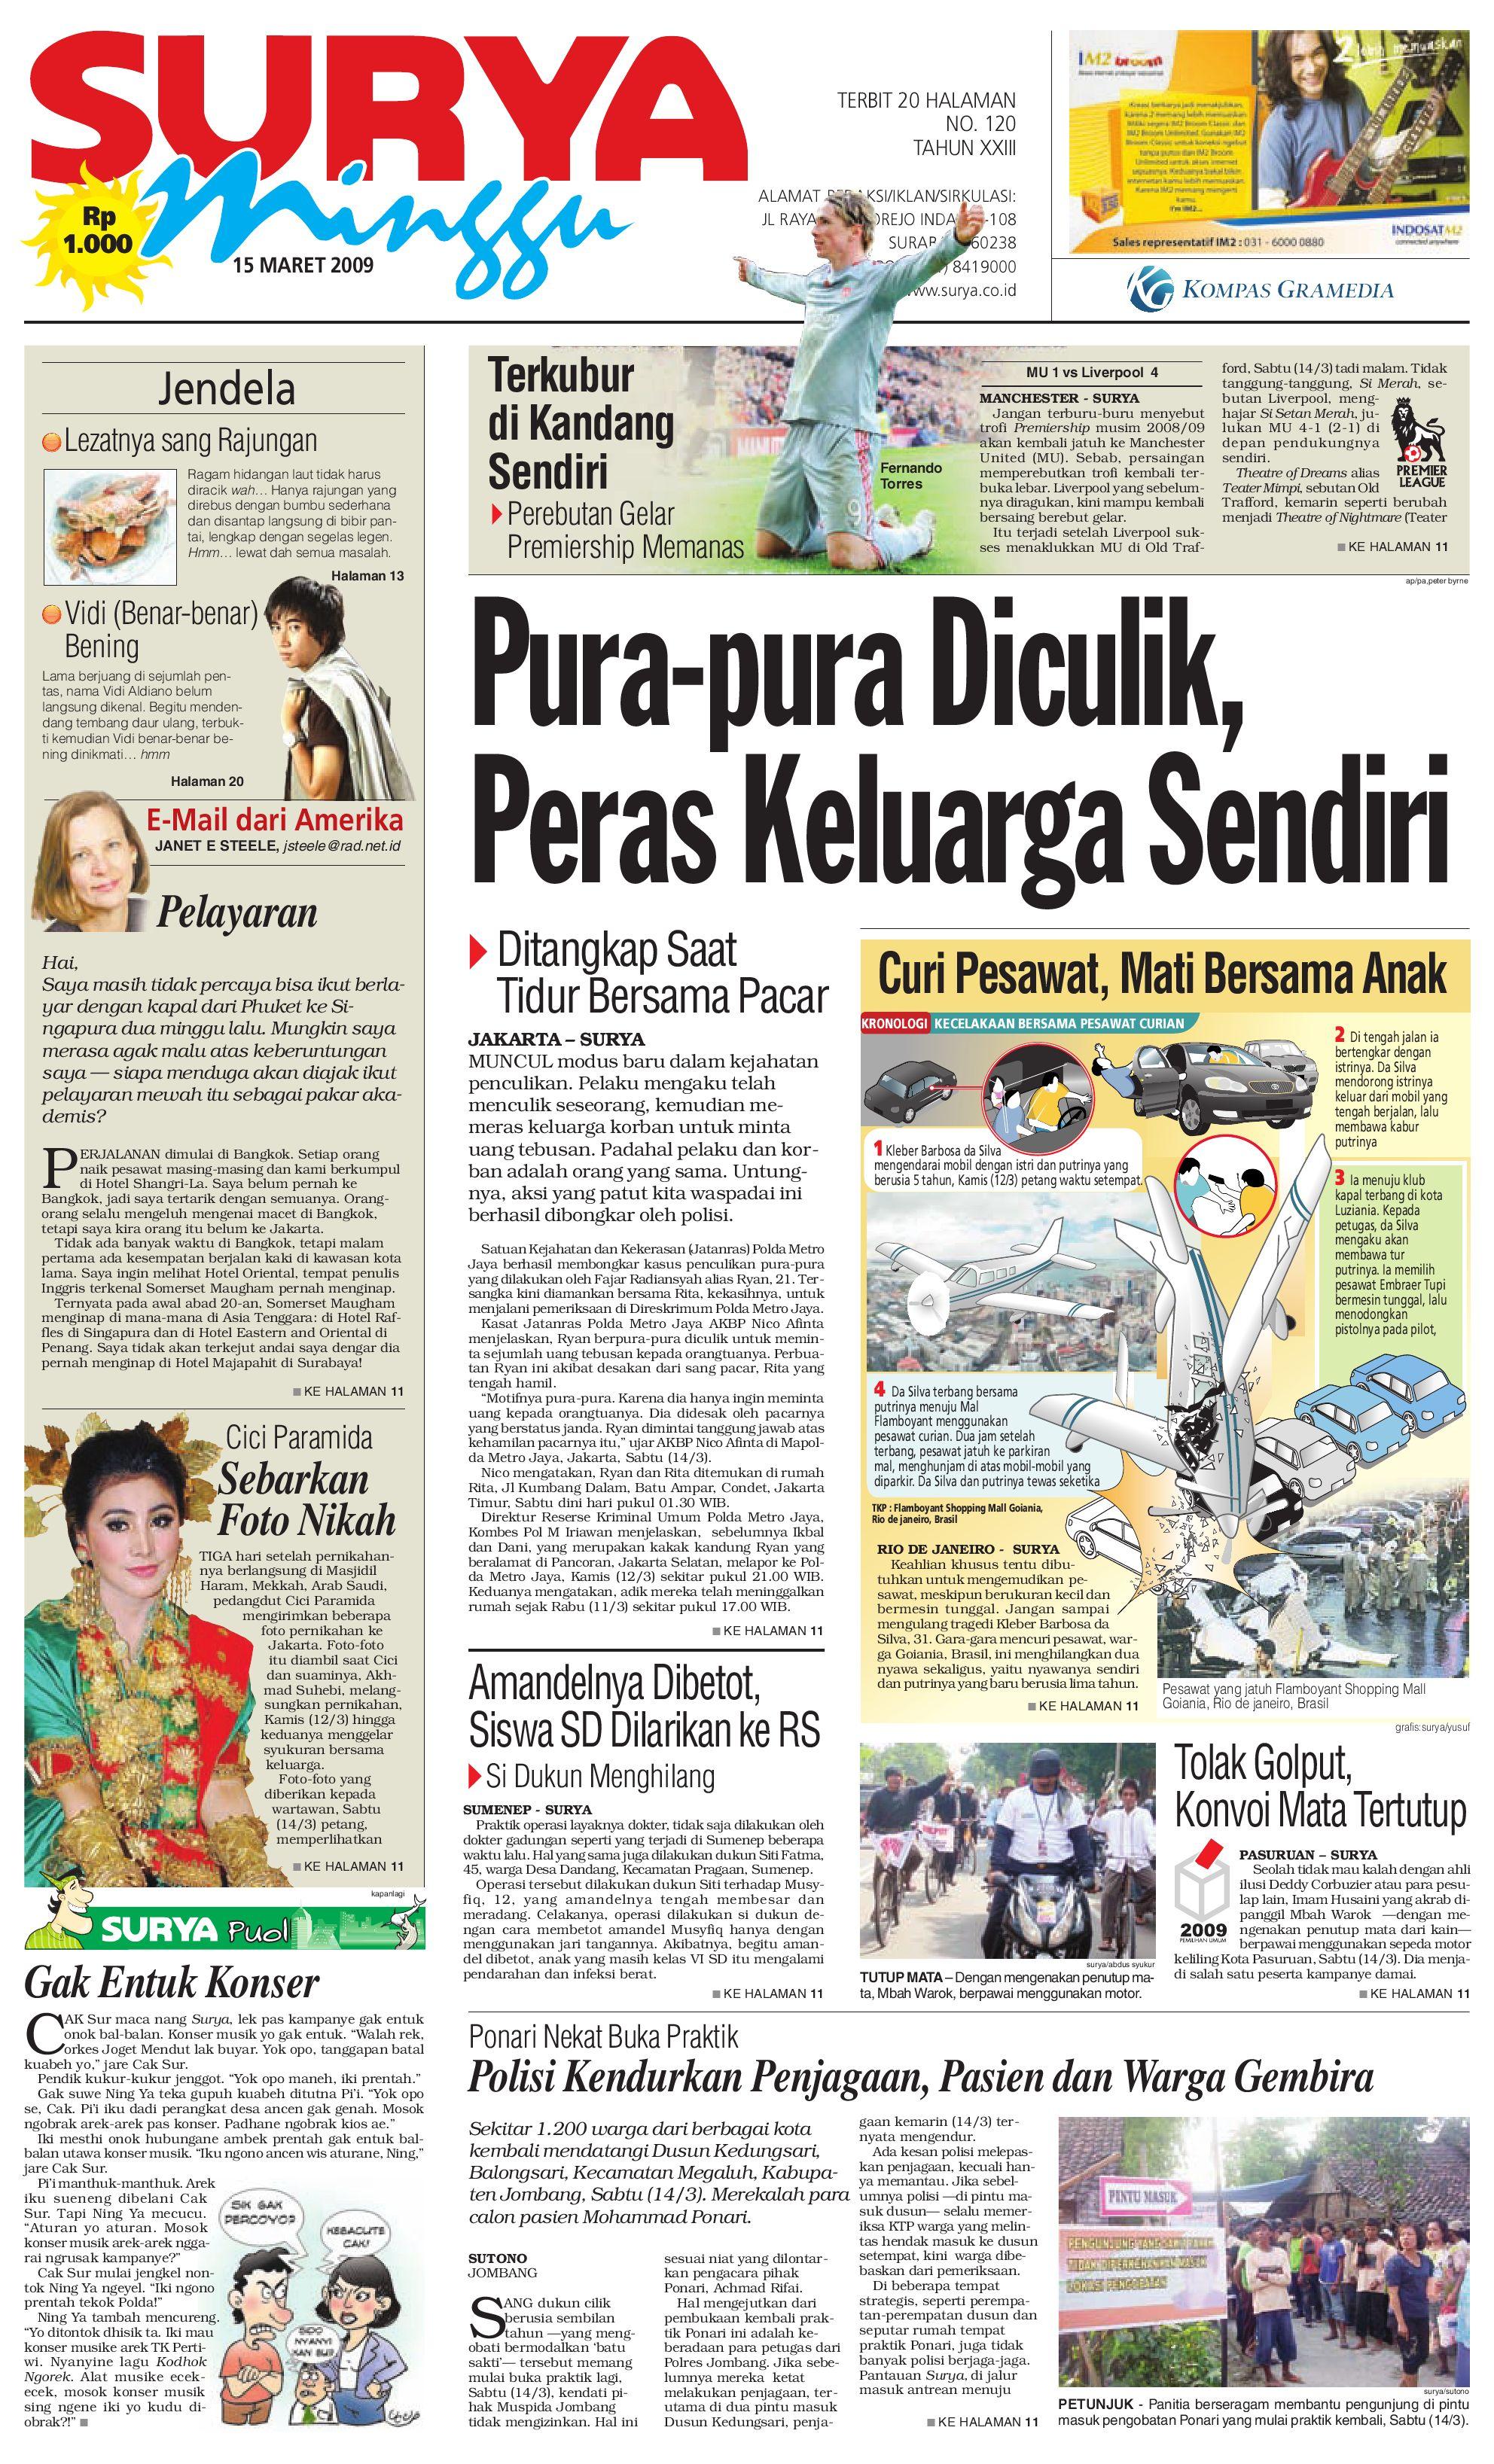 edisi cetak 15 maret 2009 by harian surya issuu